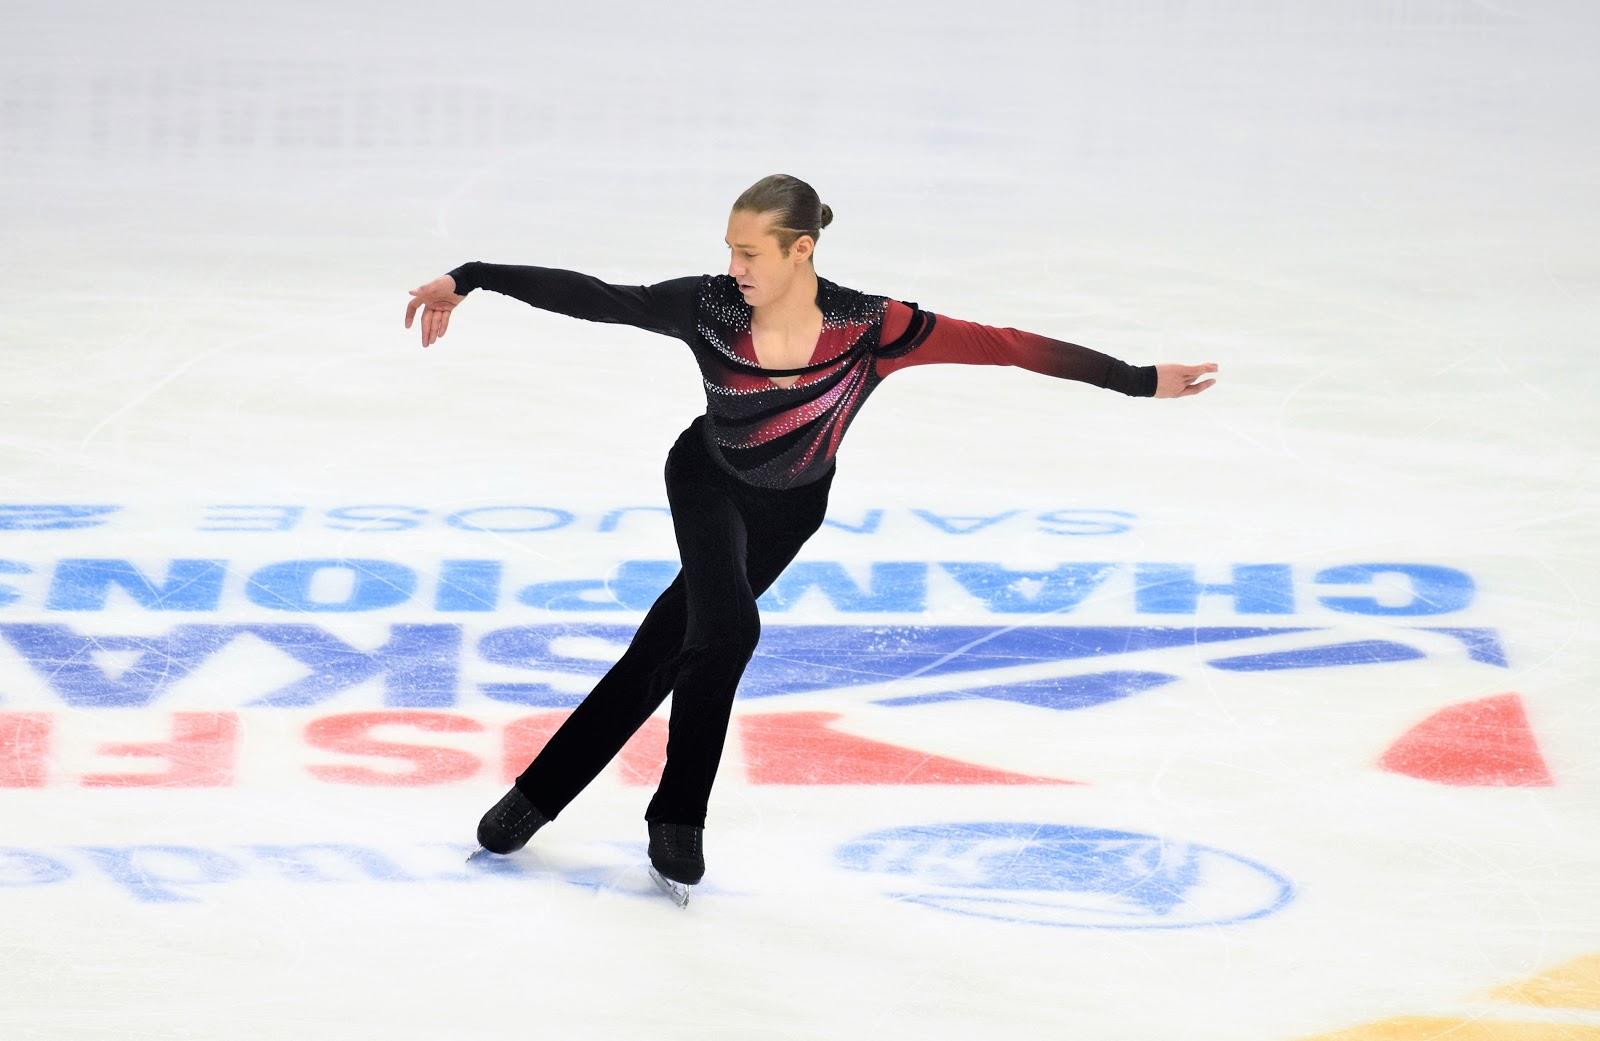 Brown Gray Men\u2019s Small figure skating shirt